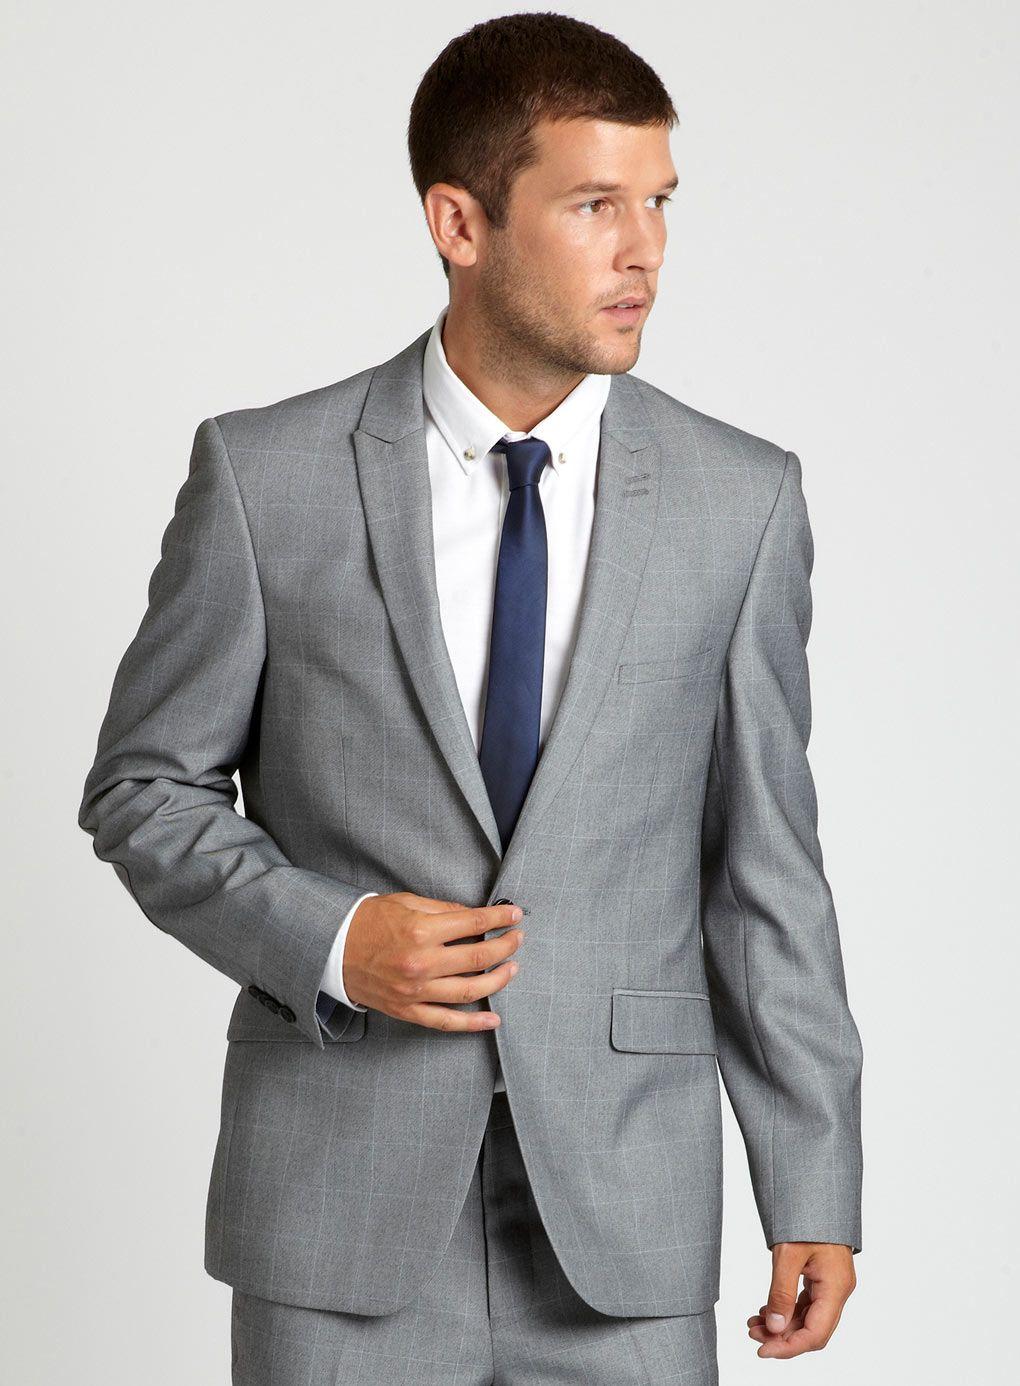 grey suit shirt tie color combinations - Google Search ...